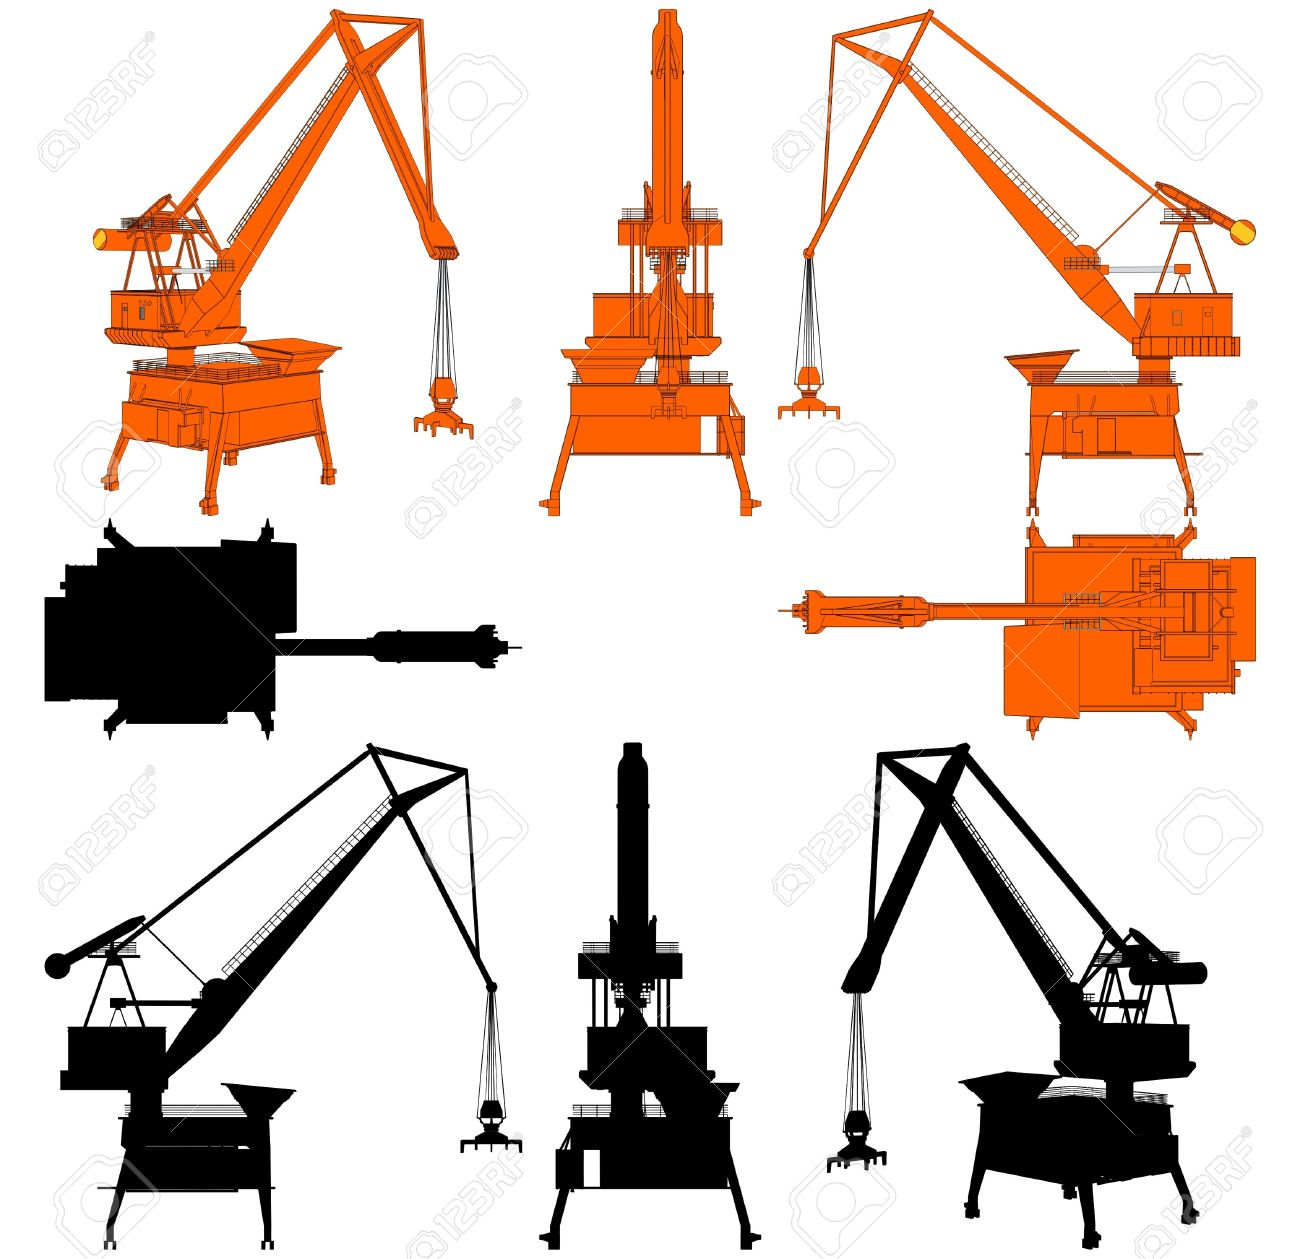 398 Shipyard Stock Vector Illustration And Royalty Free Shipyard.